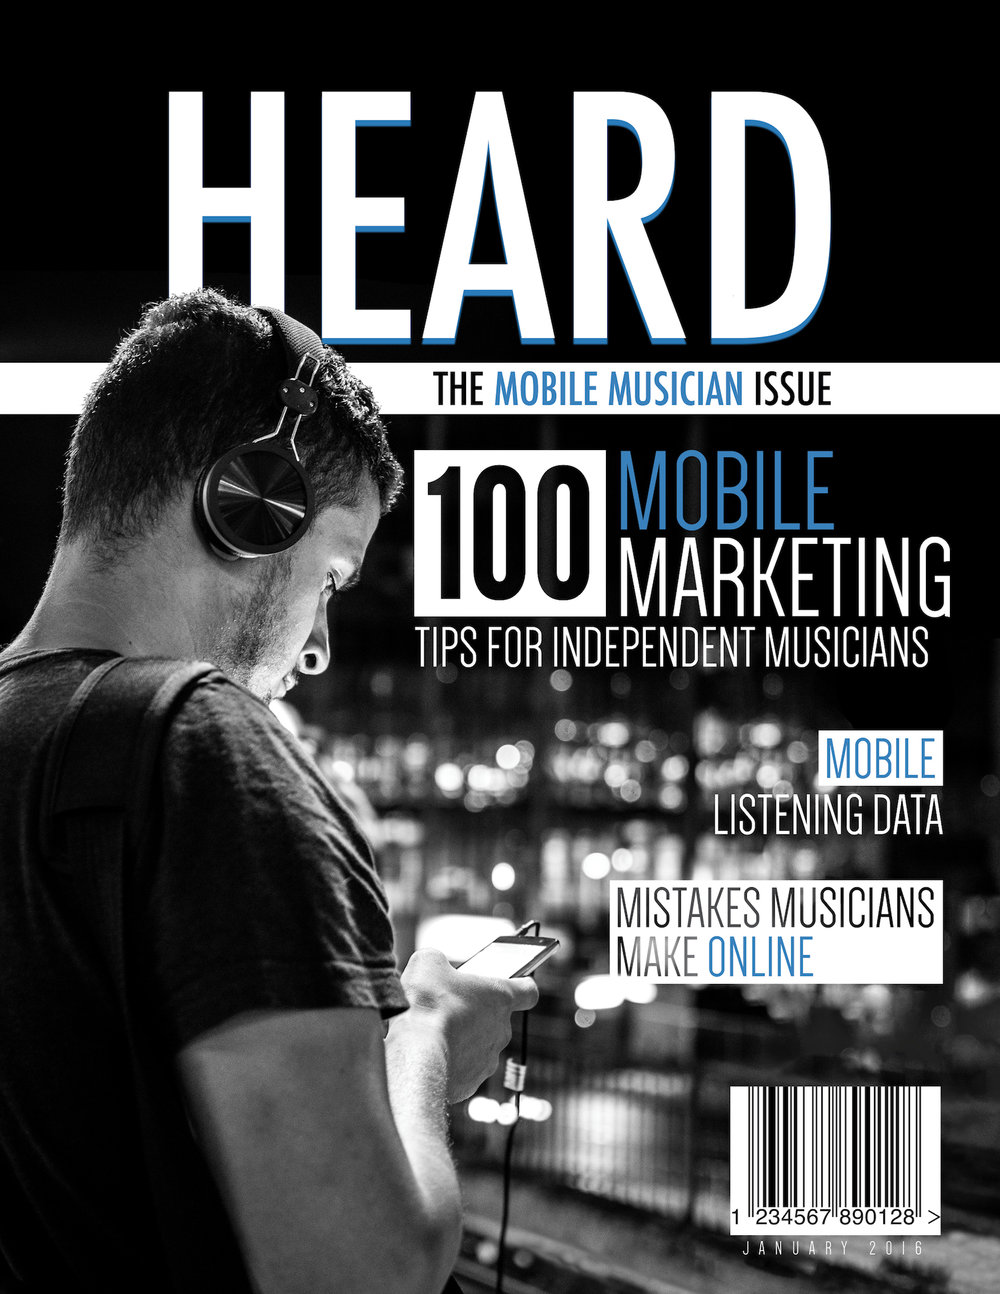 HEARD Magazine Cover - A cover for a musical magazine.